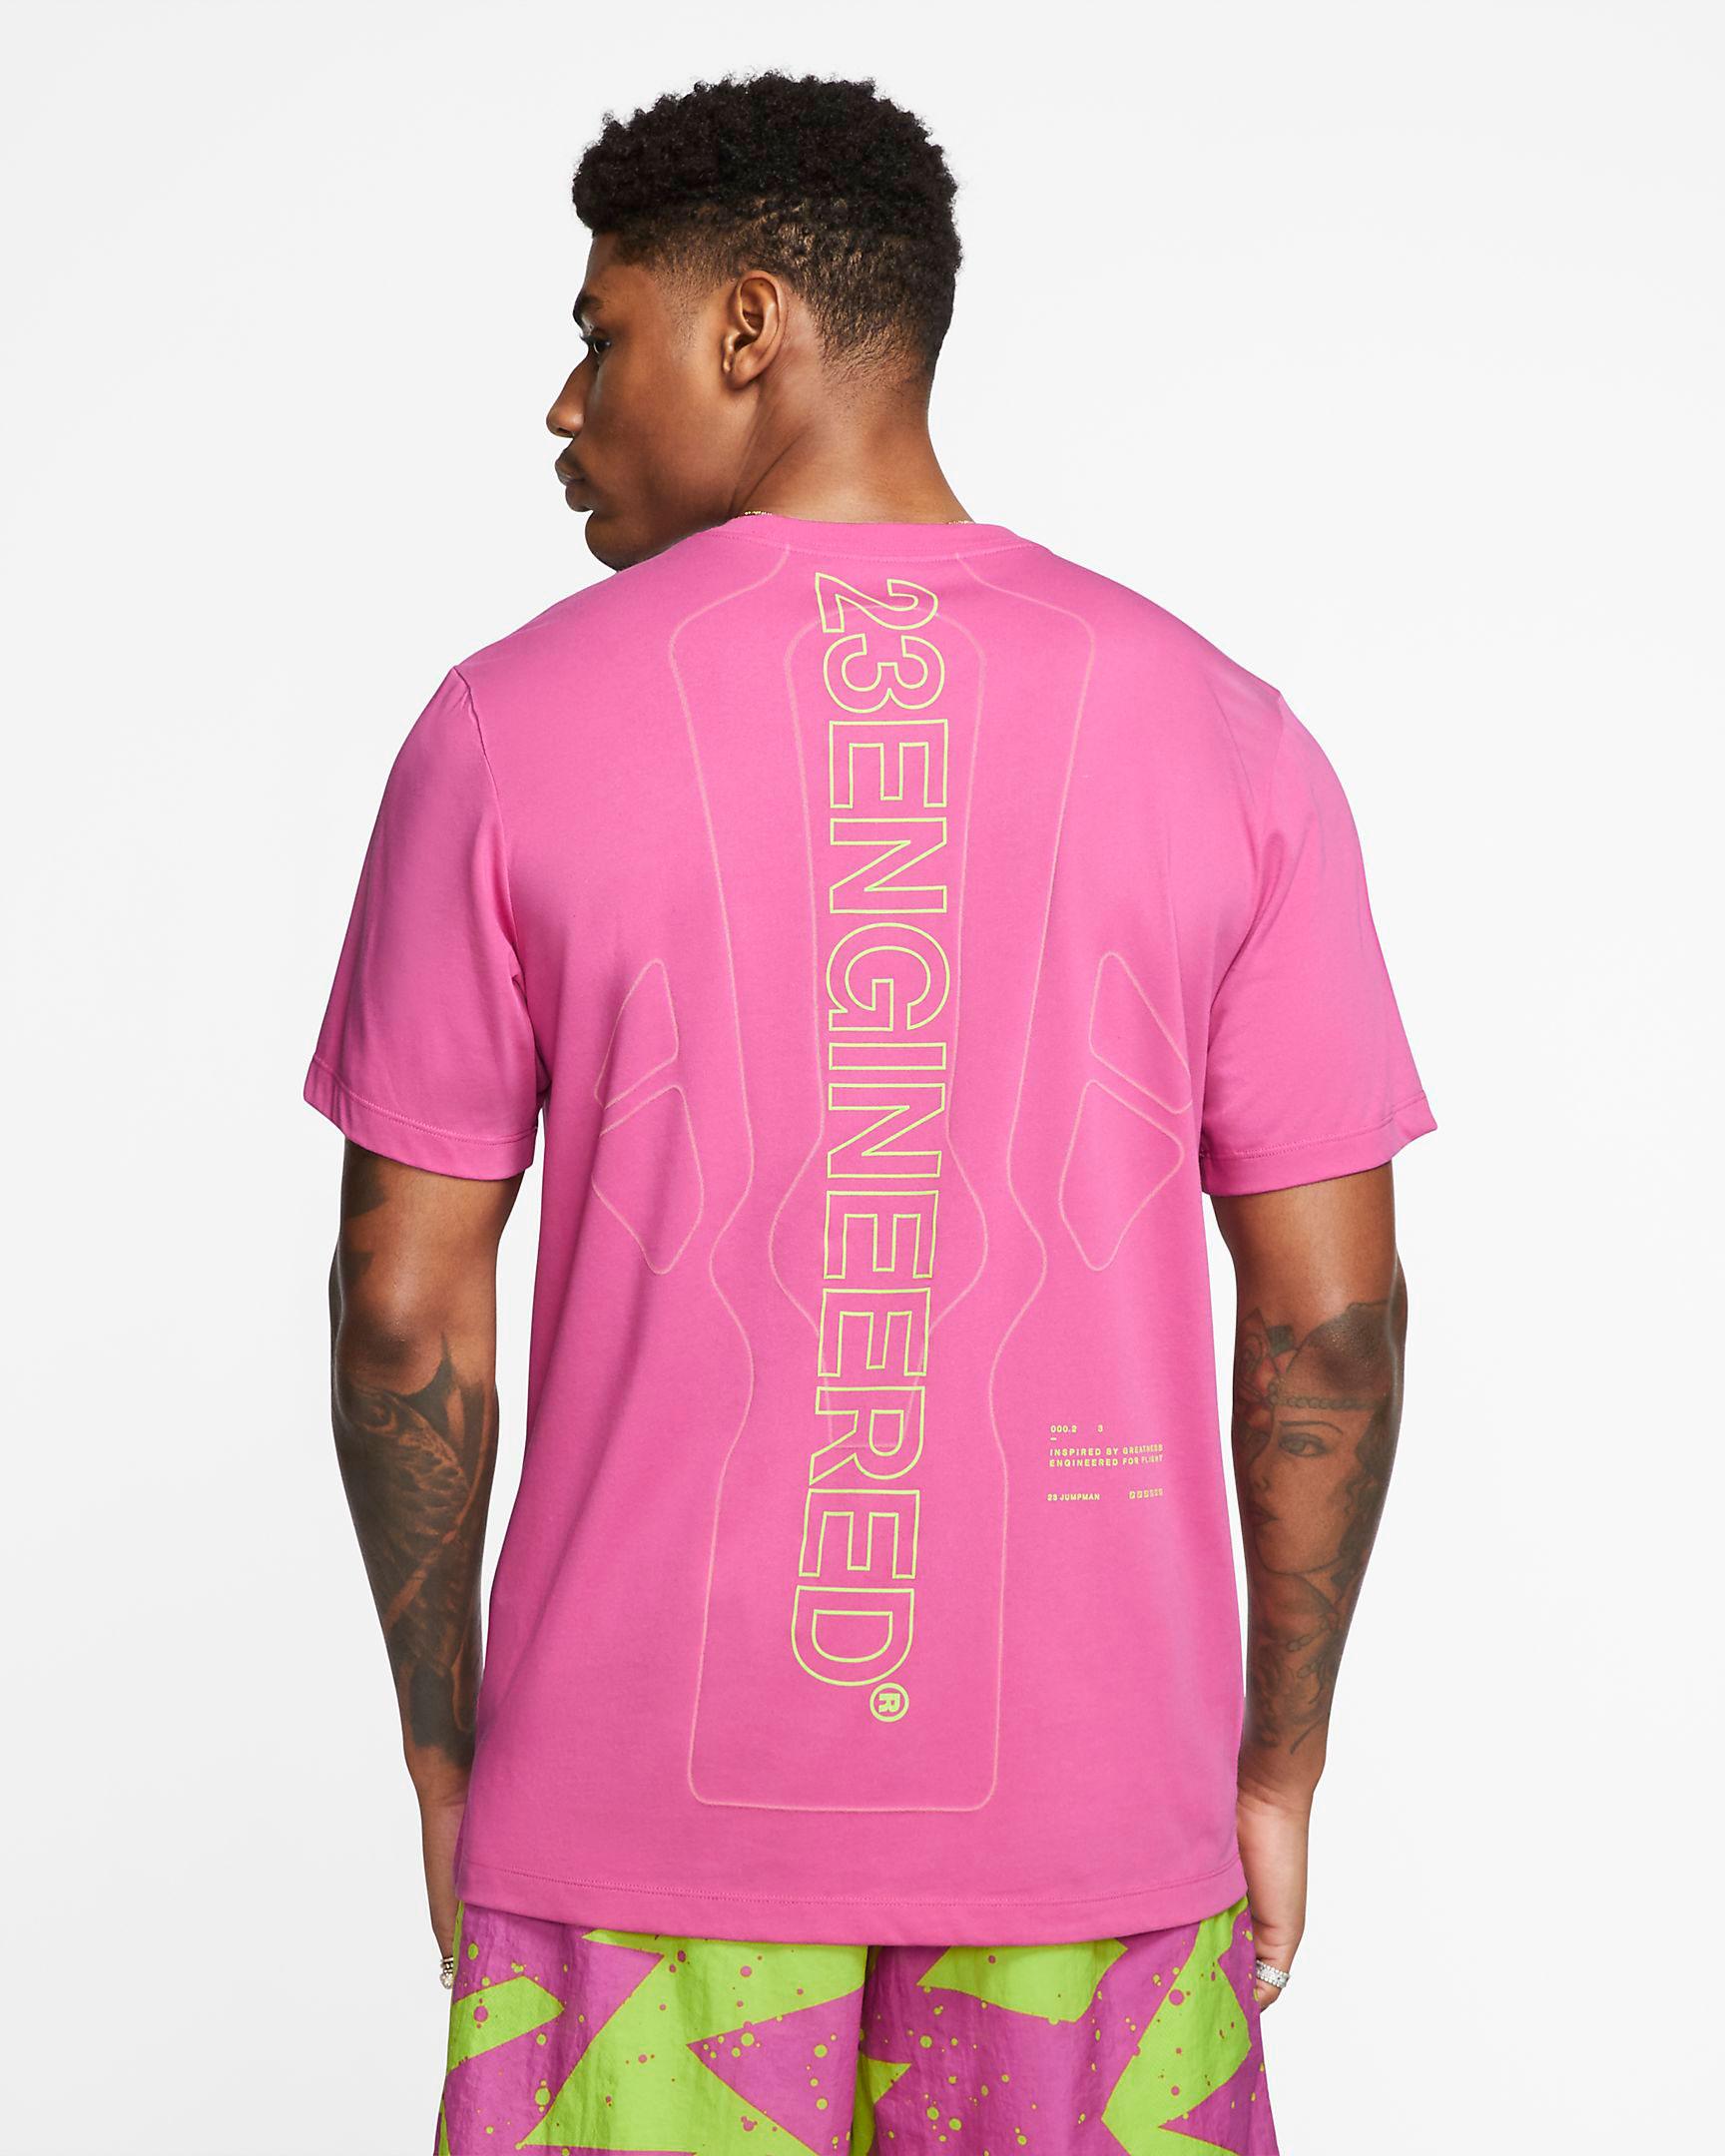 jordan-23-engineered-active-fuchsia-shirt-2